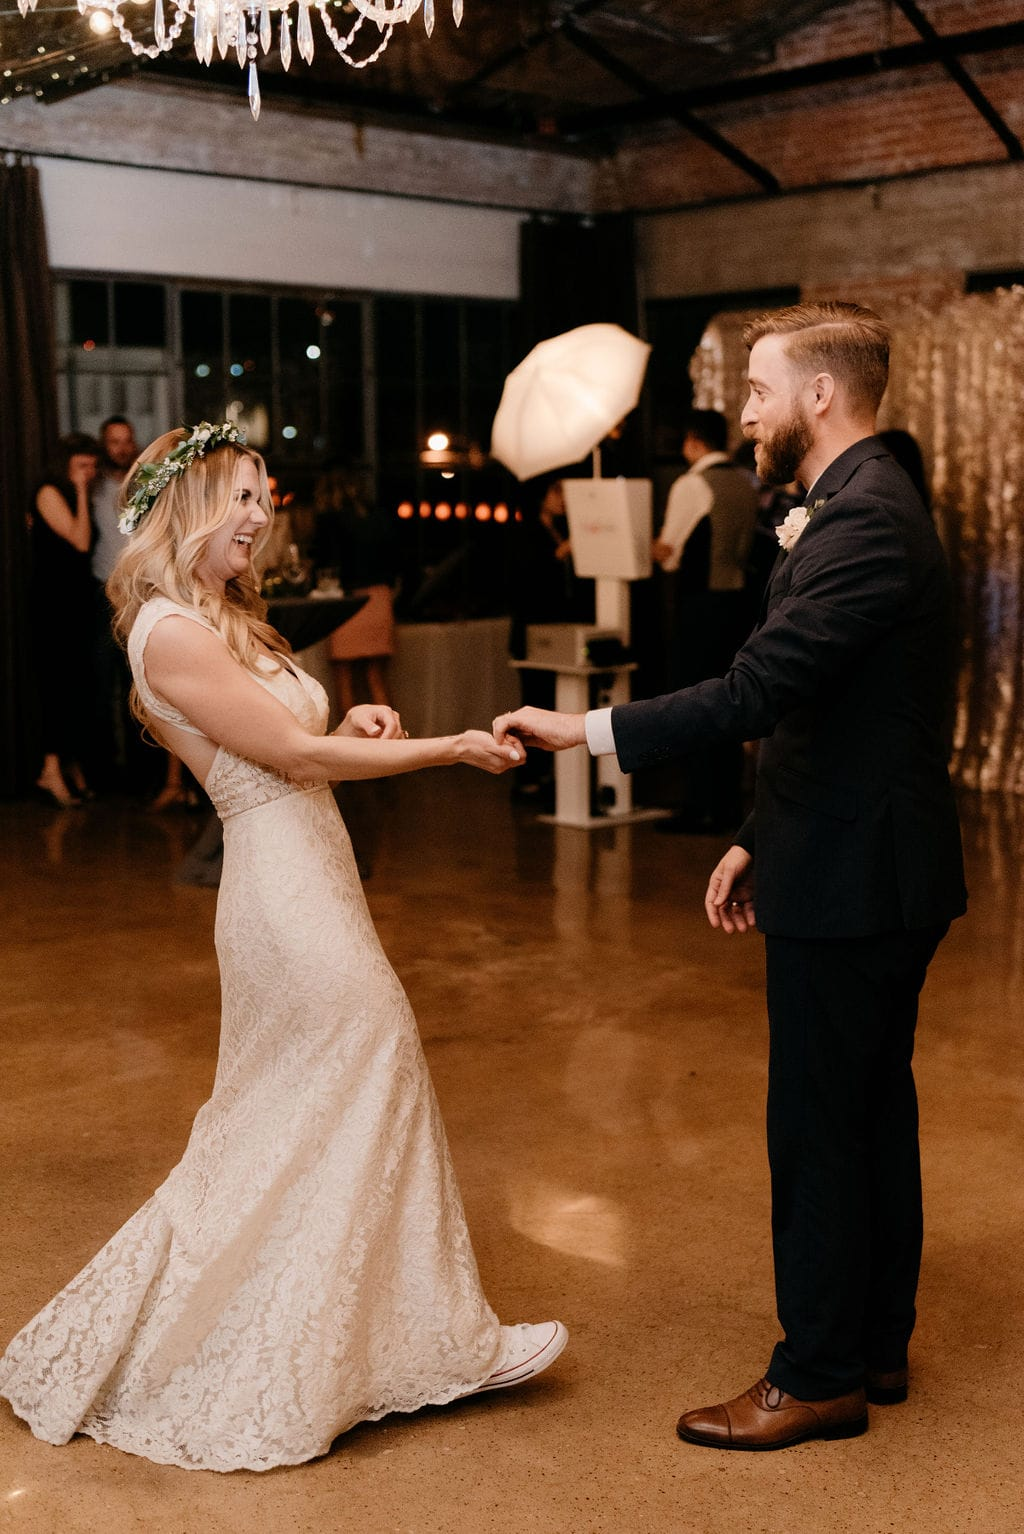 First Dance between bride and groom at hickory street annex wedding reception in Deep ellum